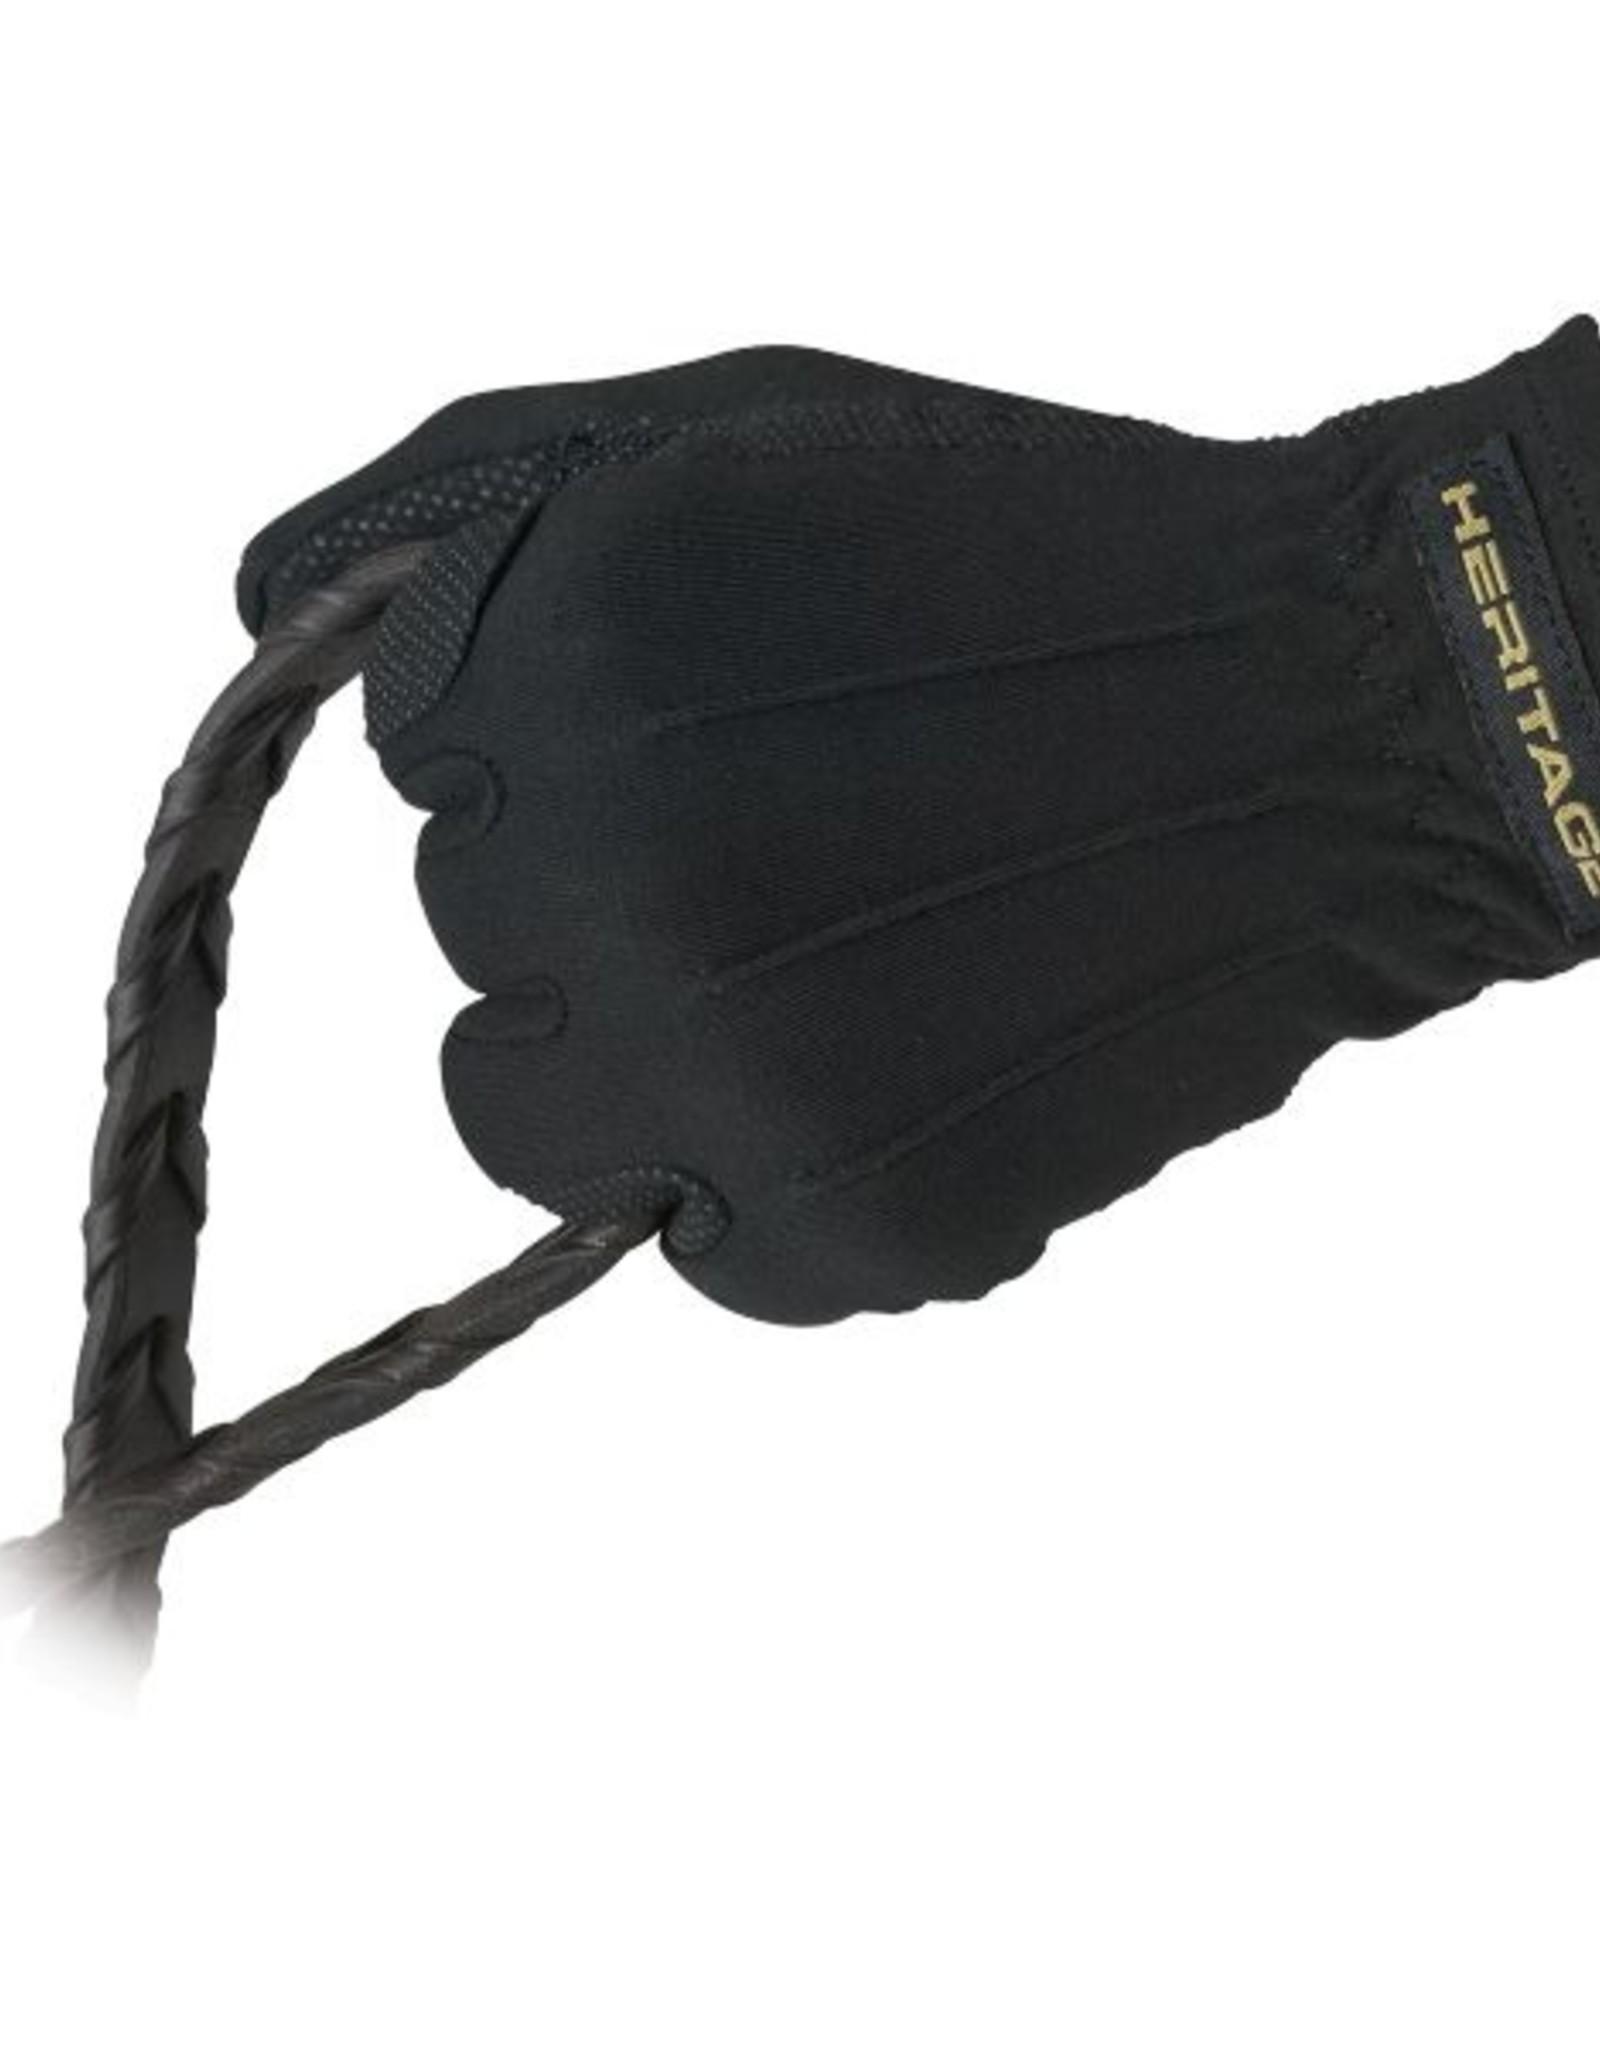 Heritage Power Grip Gloves